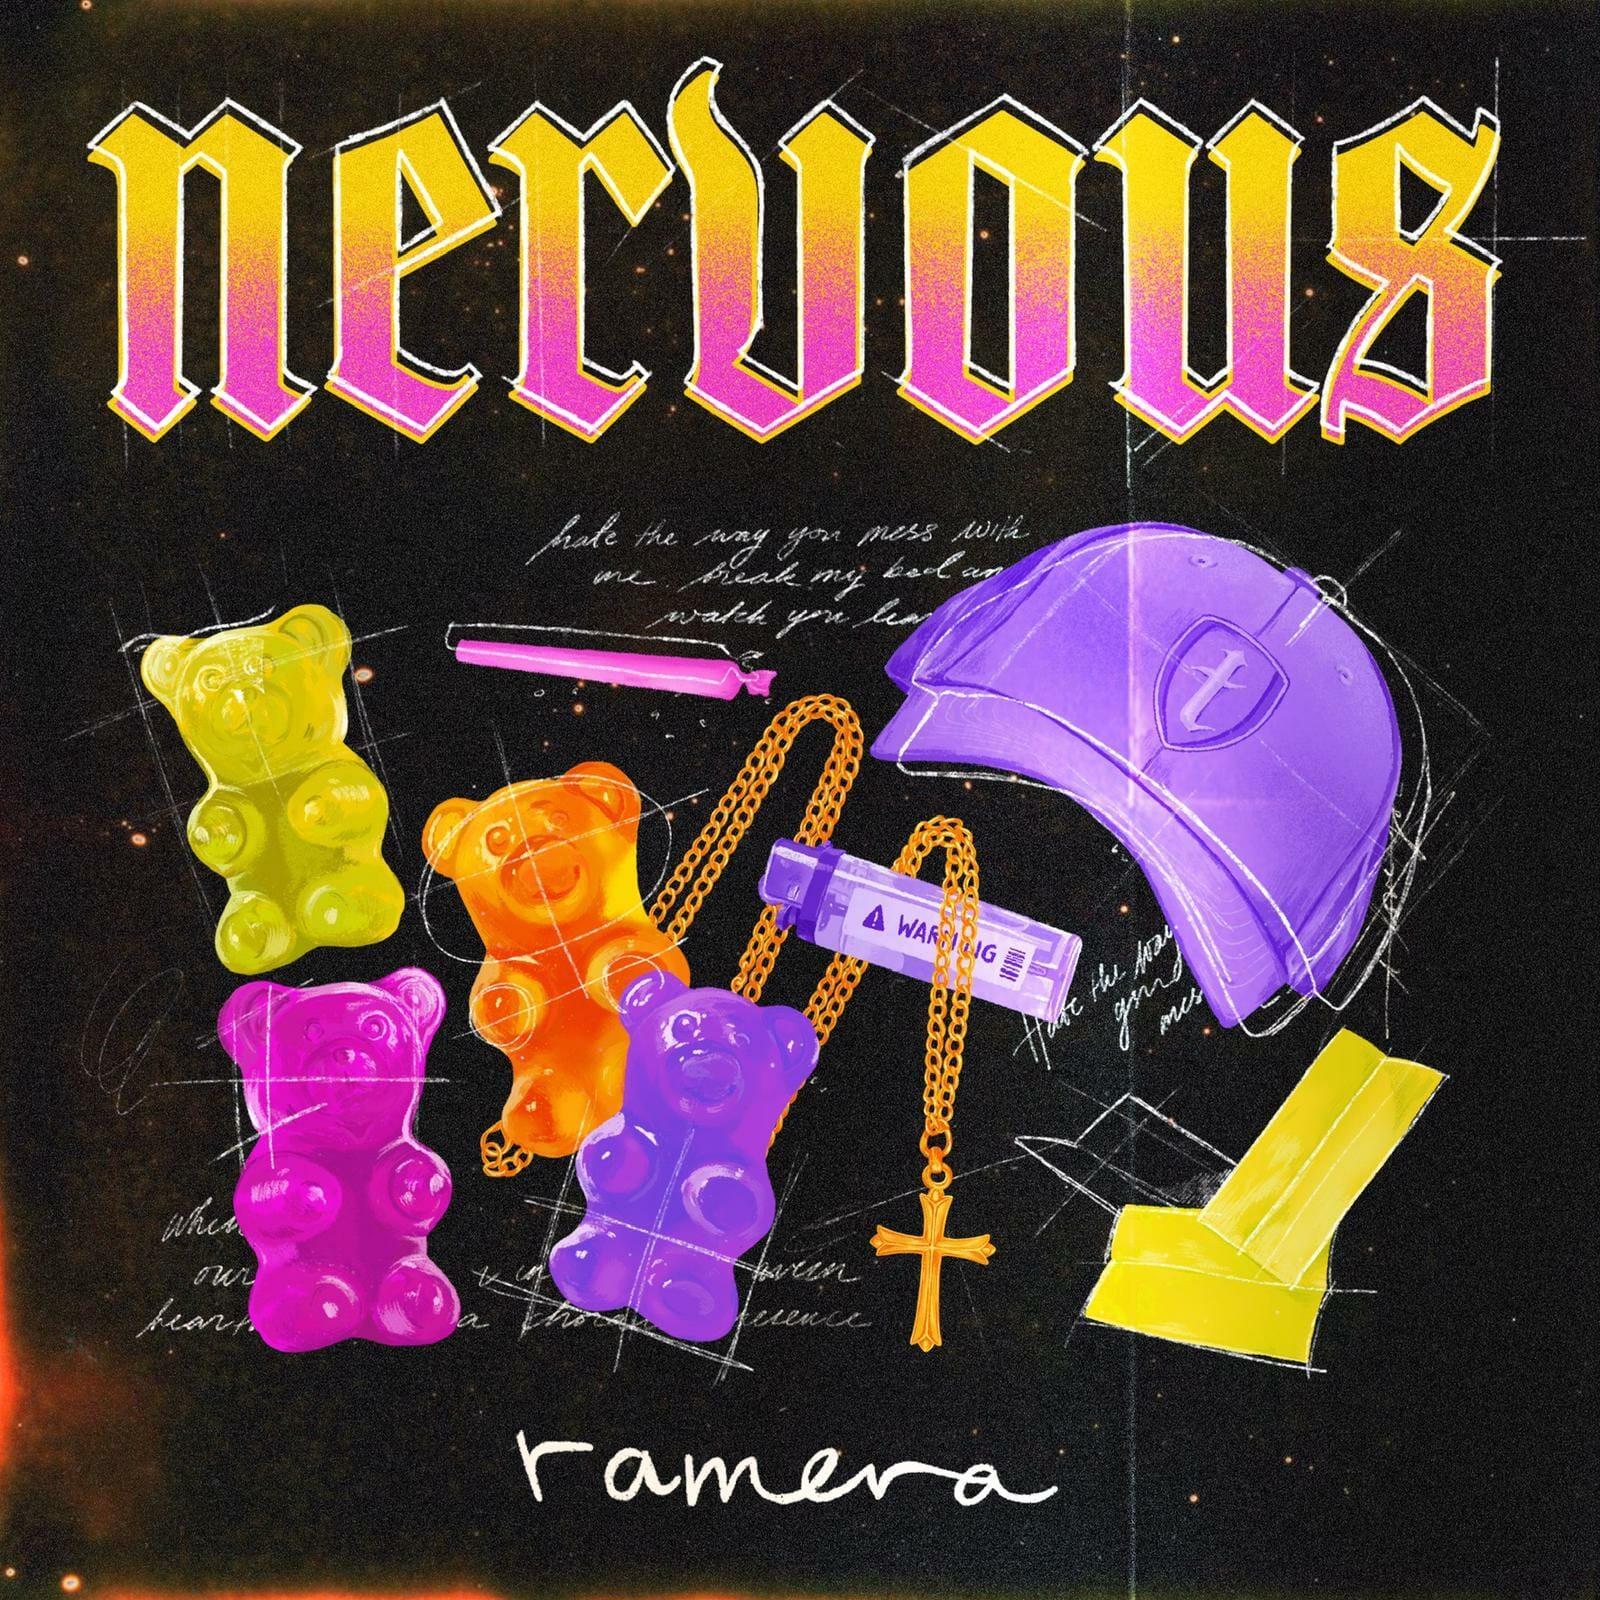 Ramera Nervous